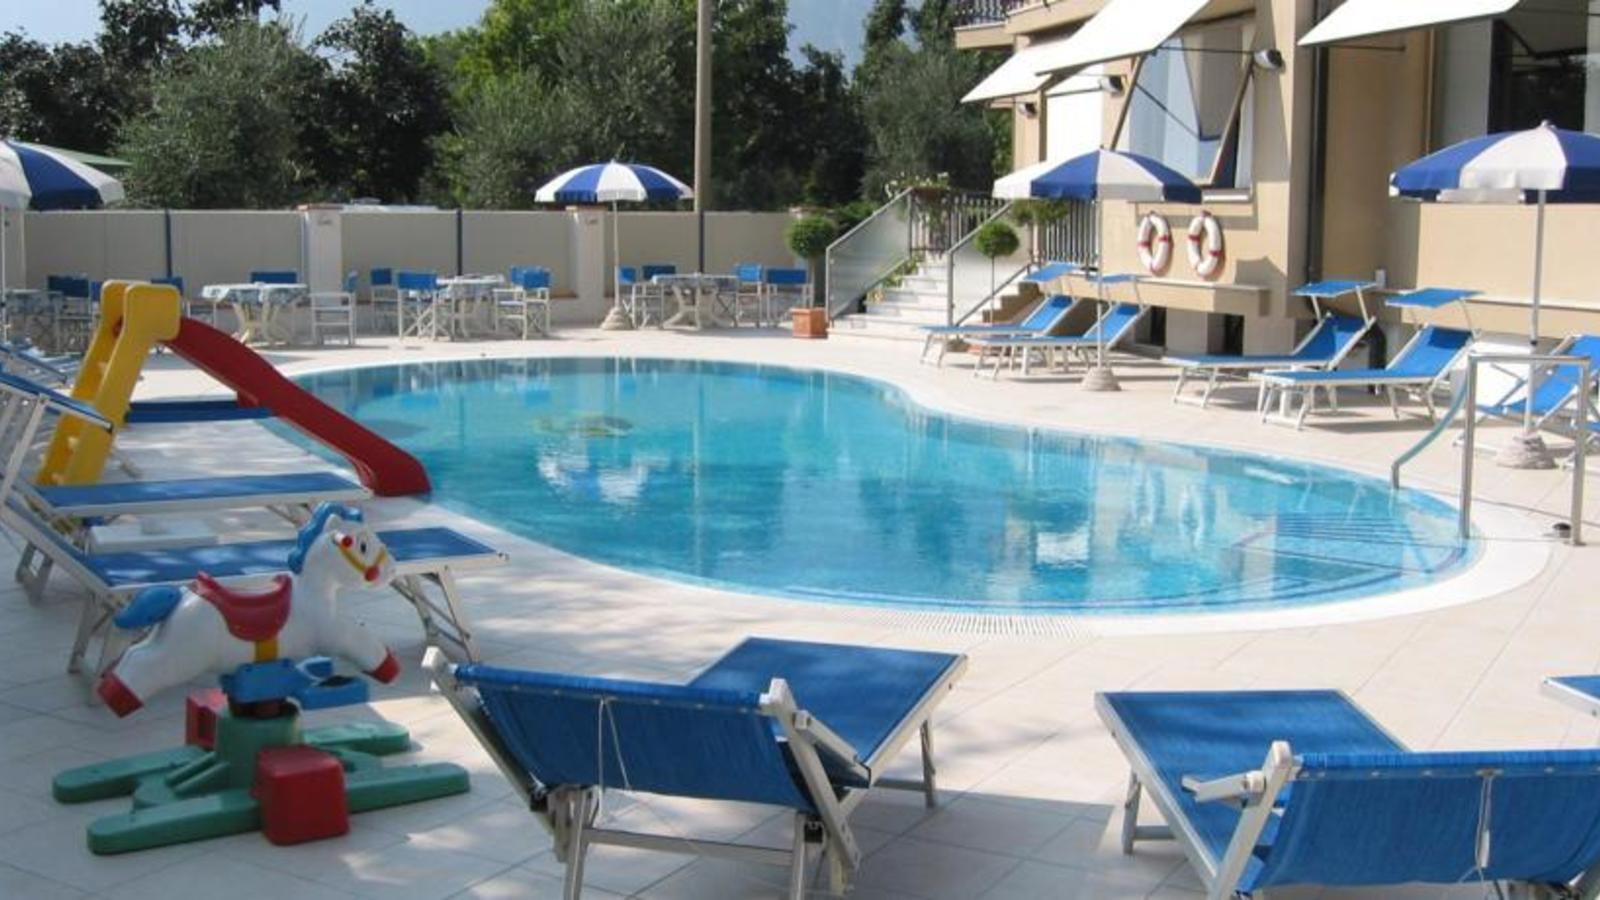 Angelini hotel torbole topflight lake garda for Angelini arredamenti fasano